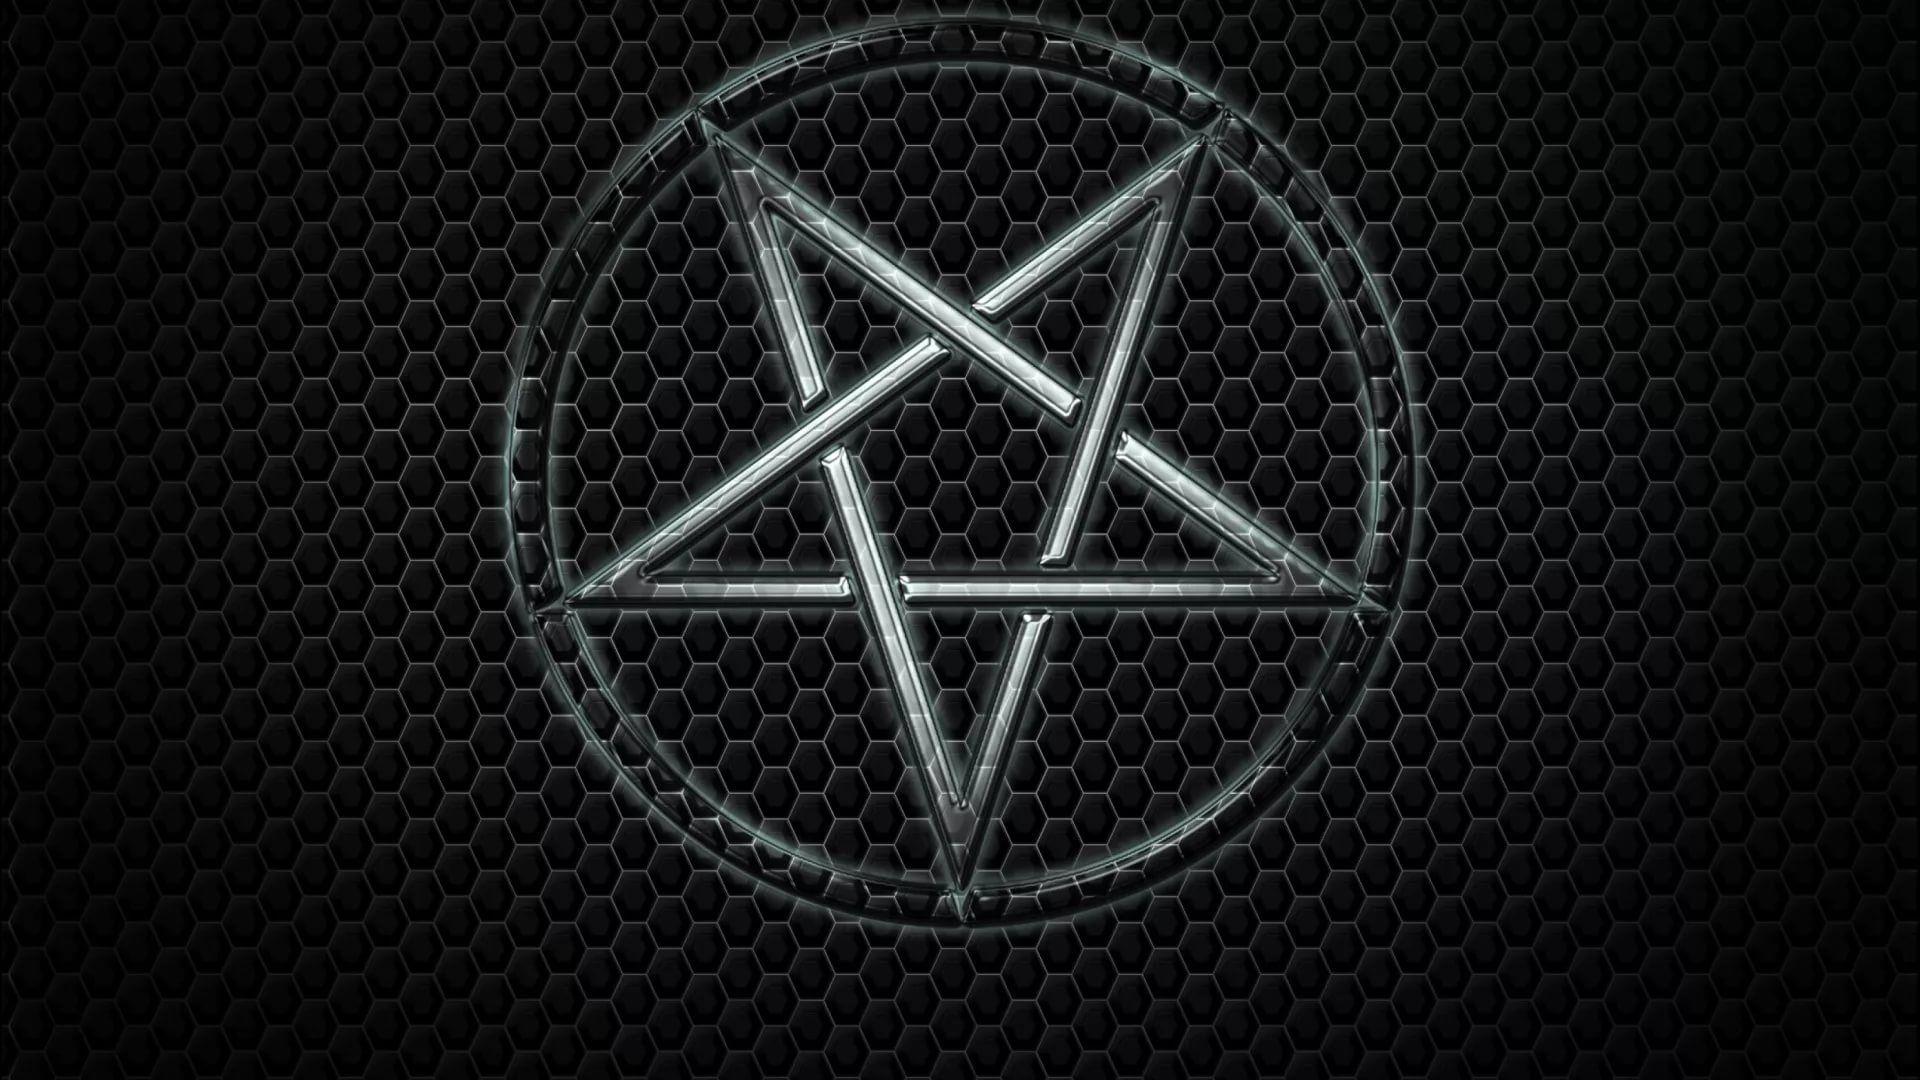 Satanic full wallpaper